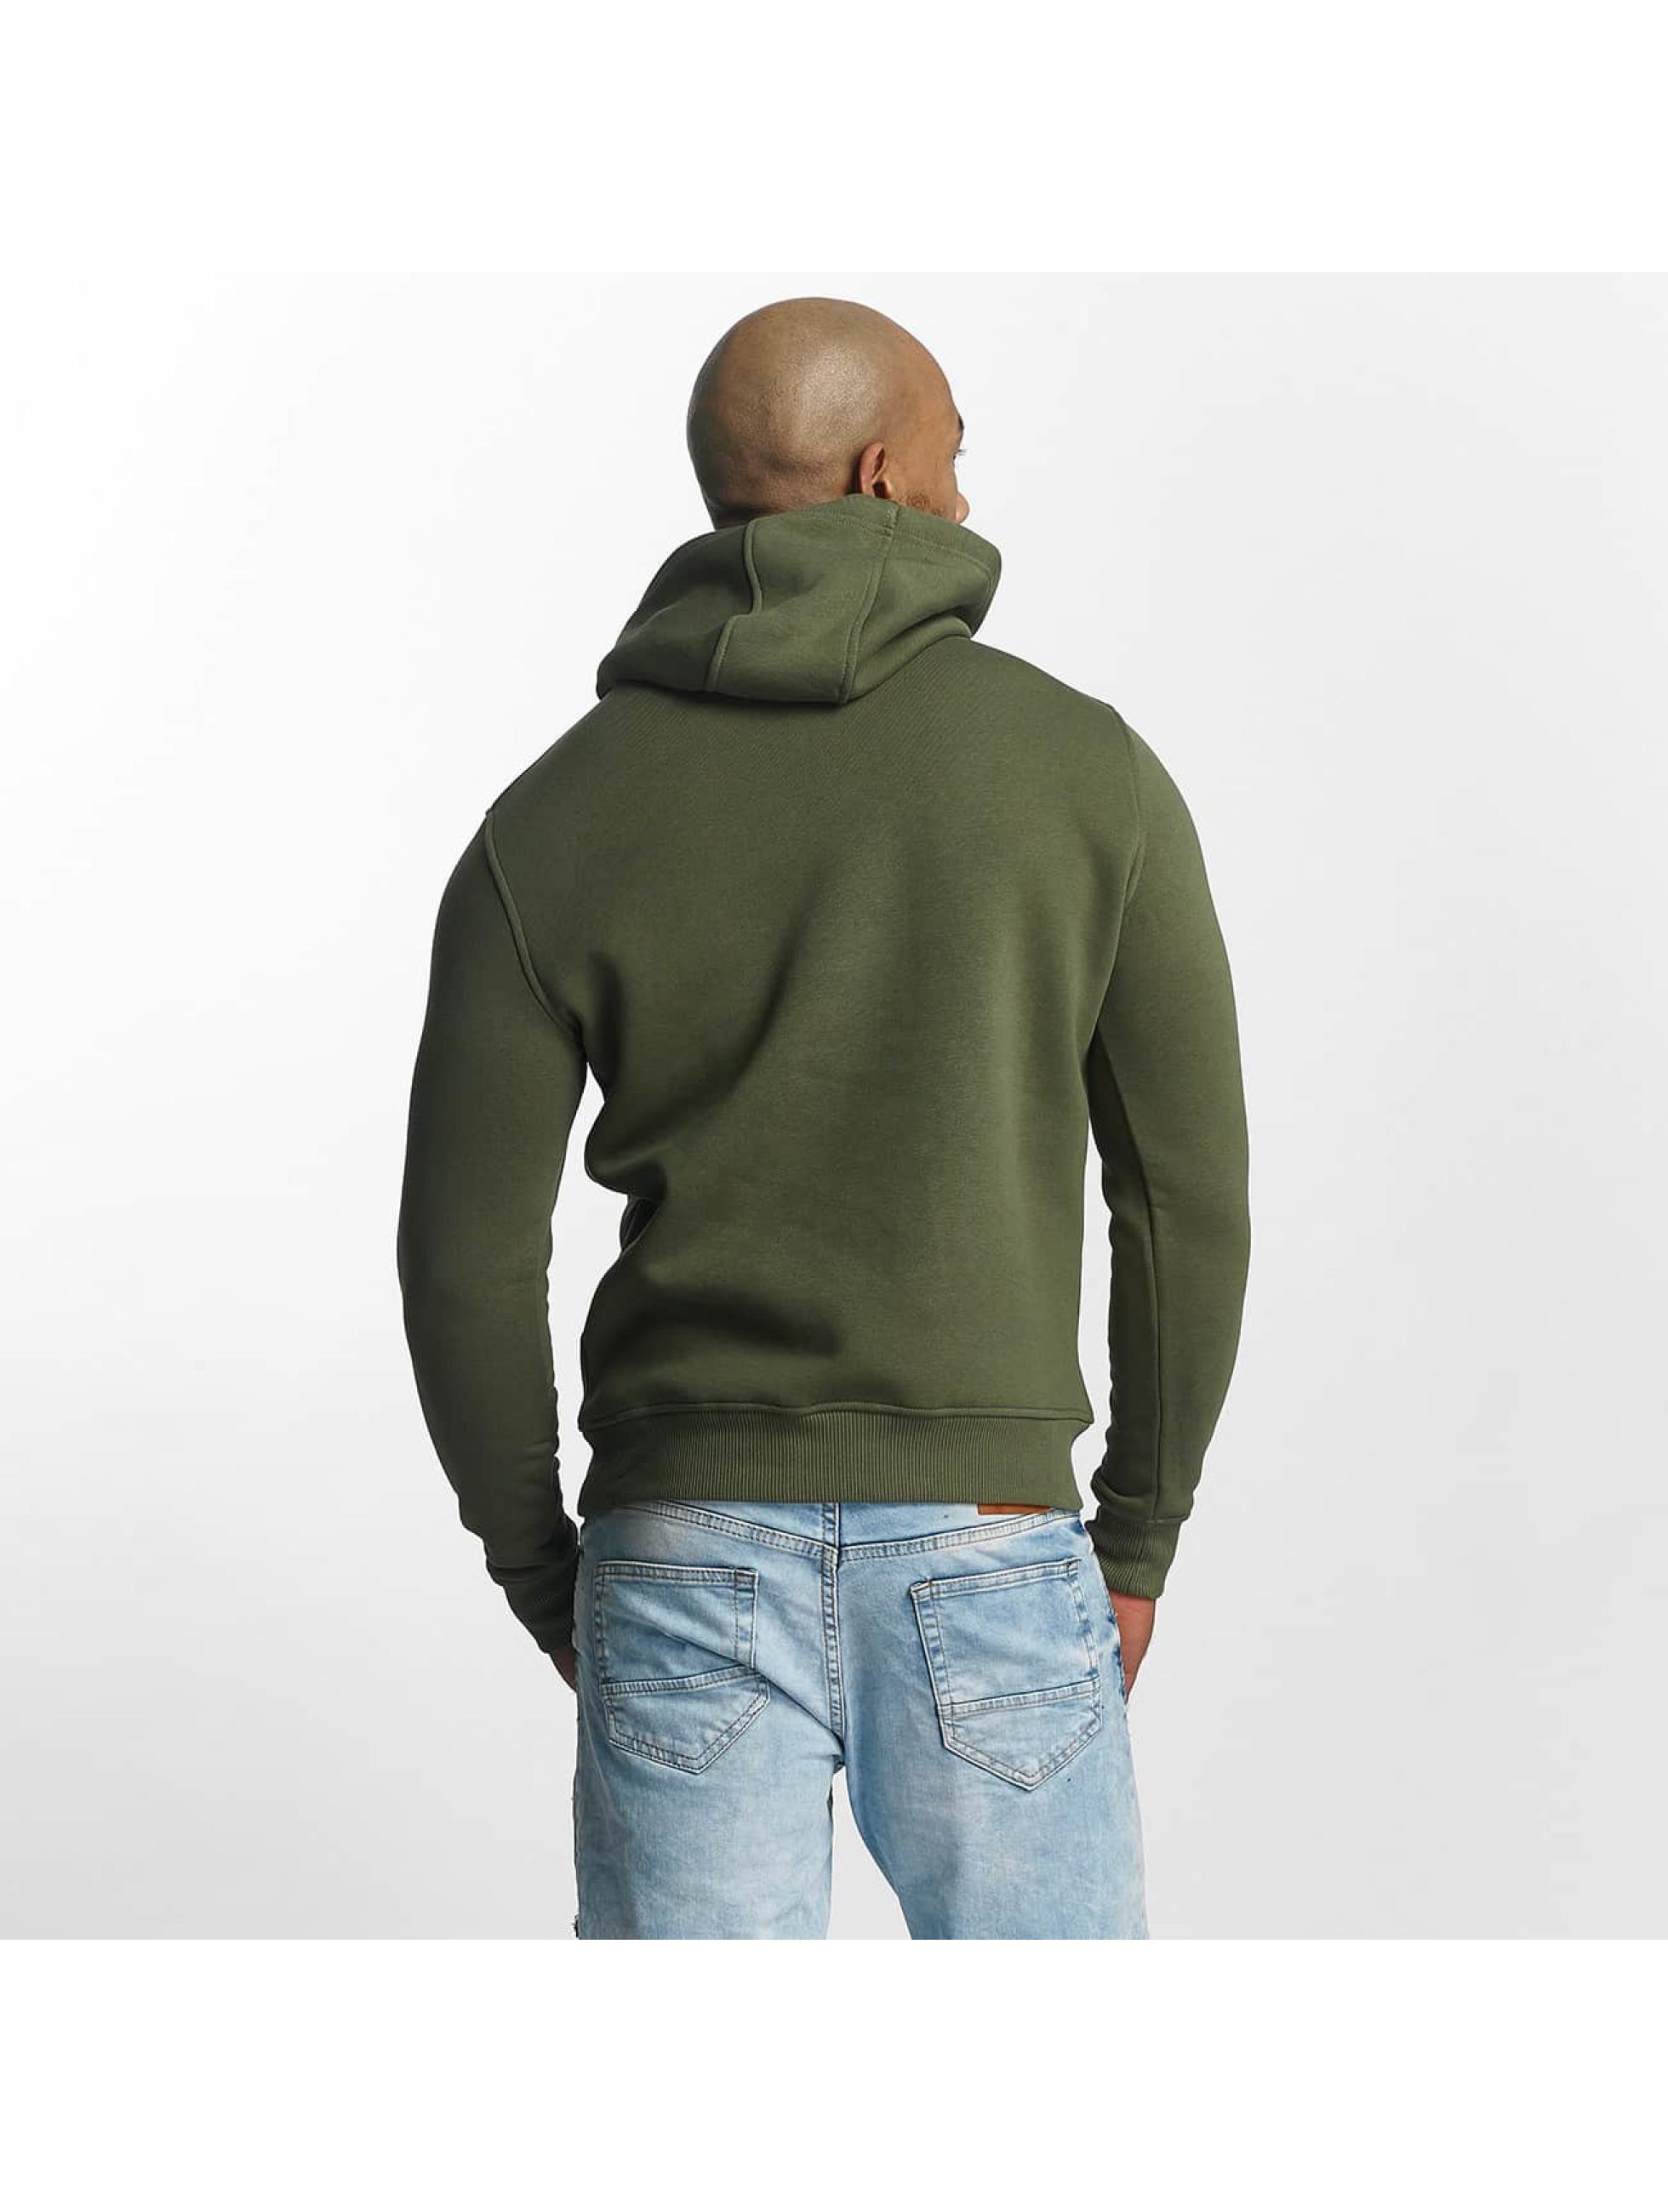 online retailer e3573 c618d New Era NFL Camo Green Bay Packers Hoddy Night Olive